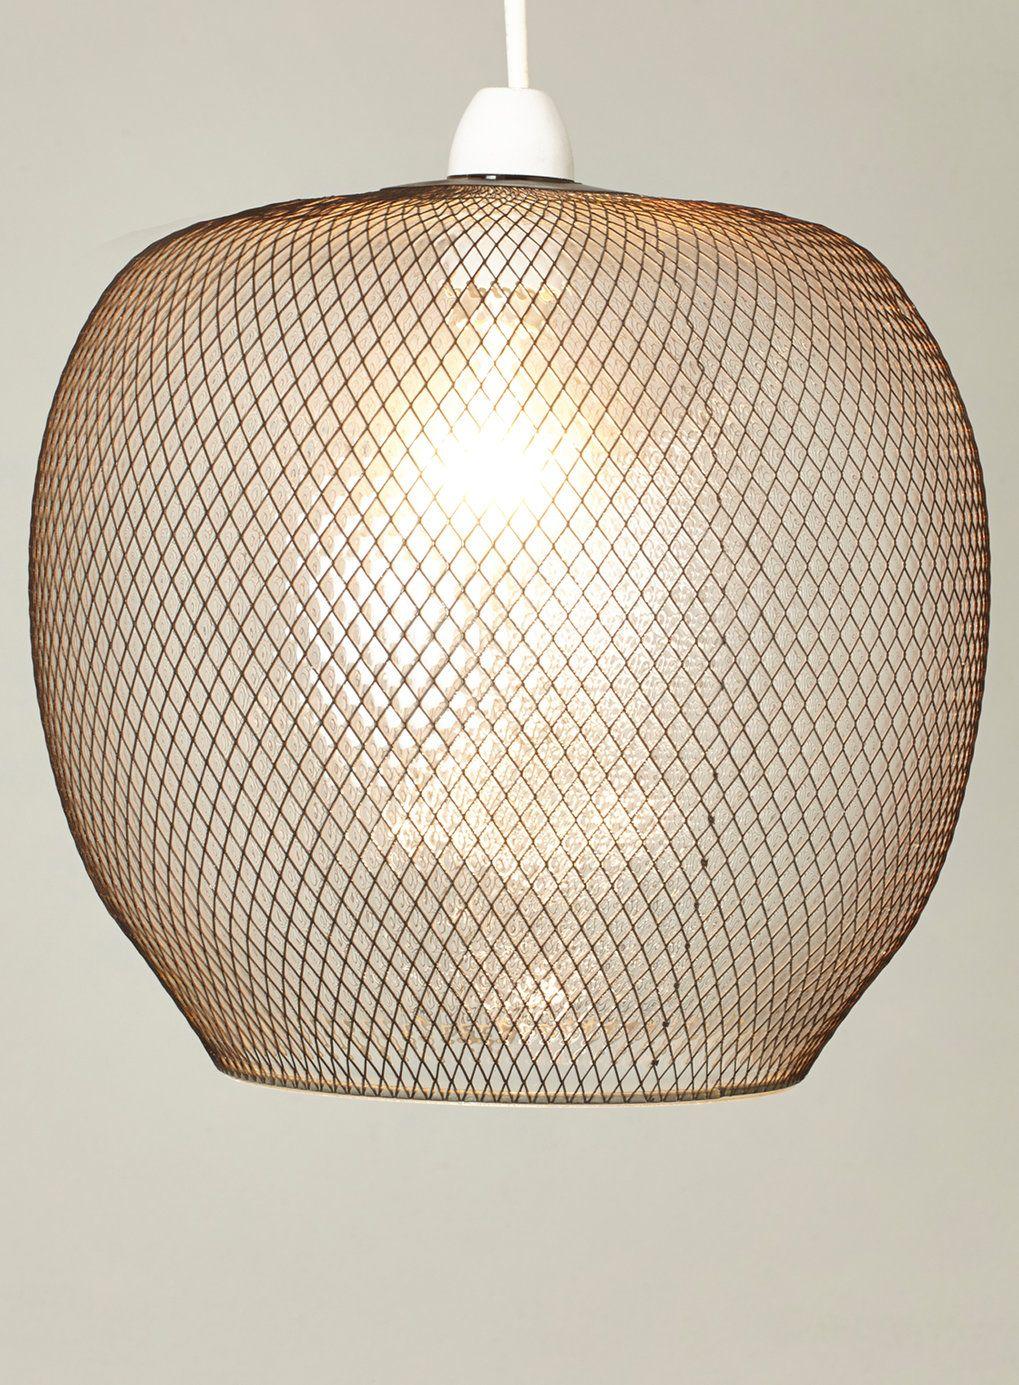 Brogan easyfit - ceiling lights - View All Lighting & Bulbs - Home ...